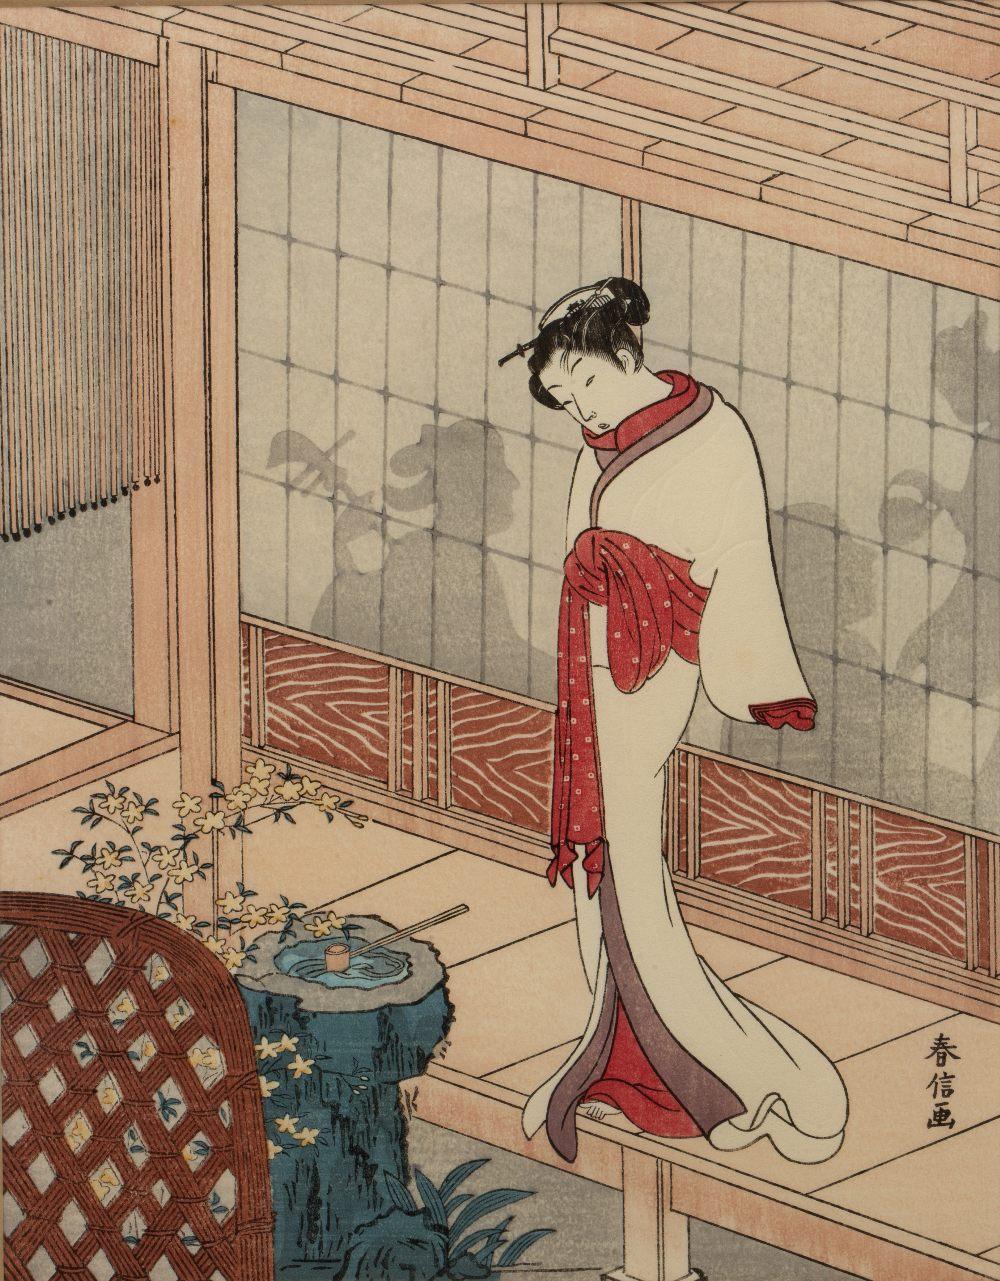 Suzuki Harunobu (1724/25-1770) 'Beautiful woman on the edge of a veranda' Japanese woodblock, 23.5cm